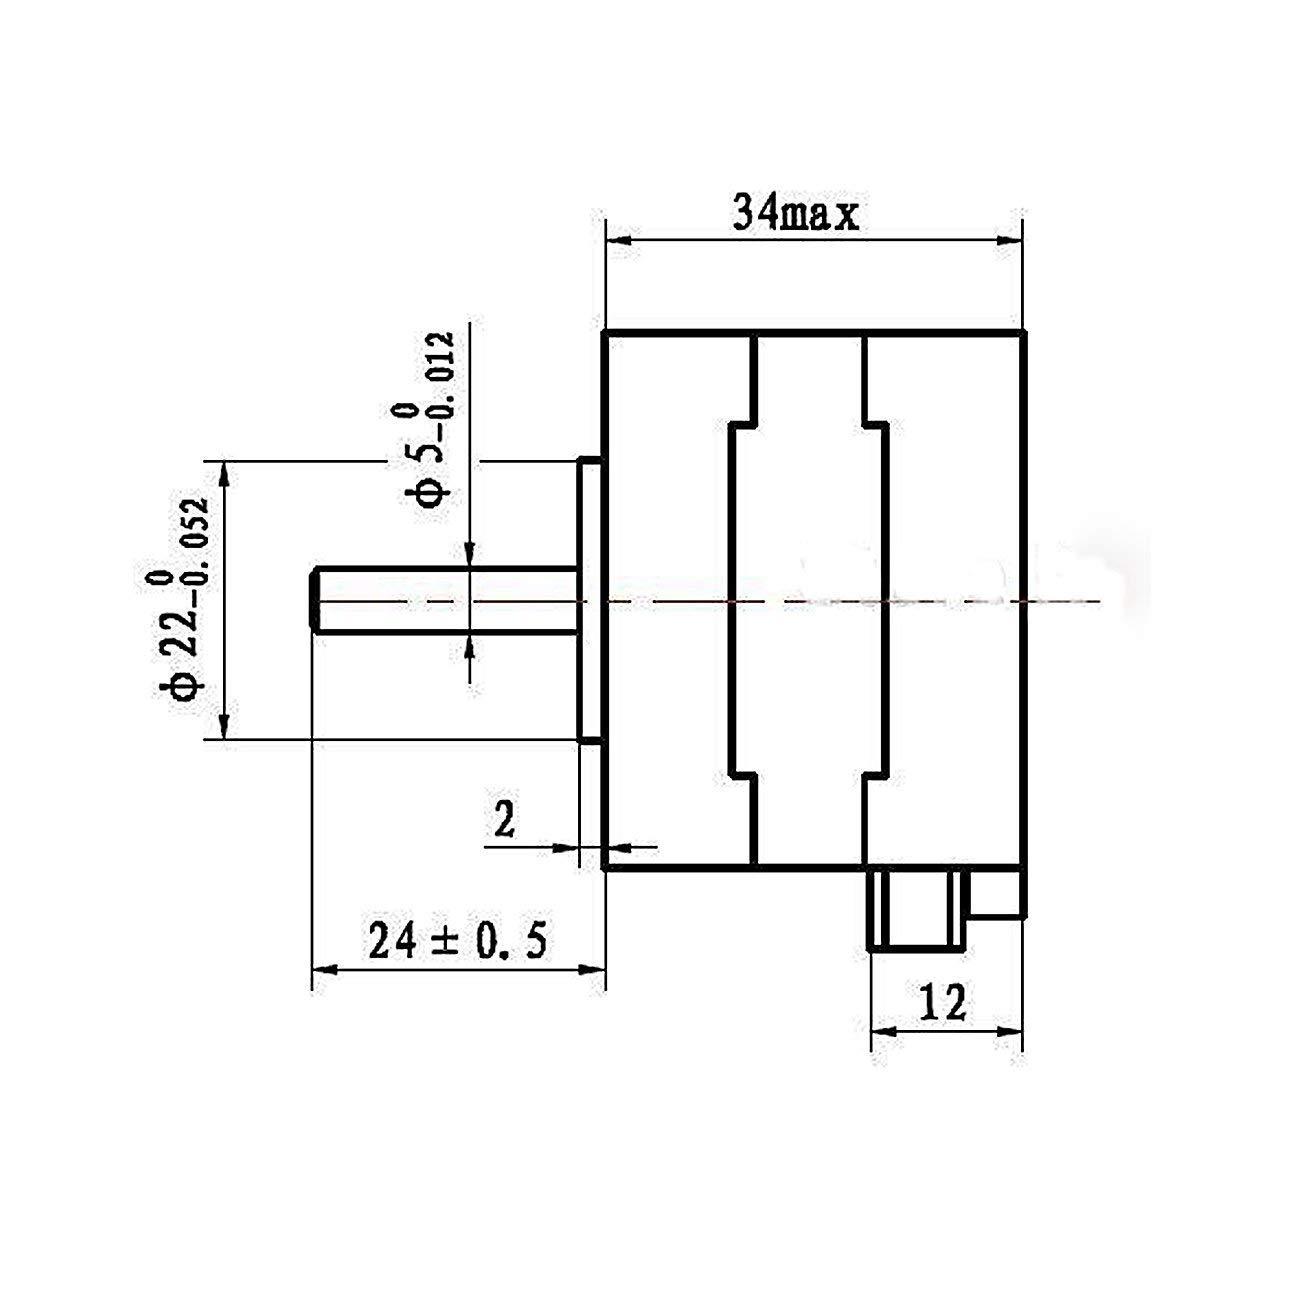 Amazon.com: Stepper Motors NEMA 17 Kit 12V for CNC Reprap 3D Printer on